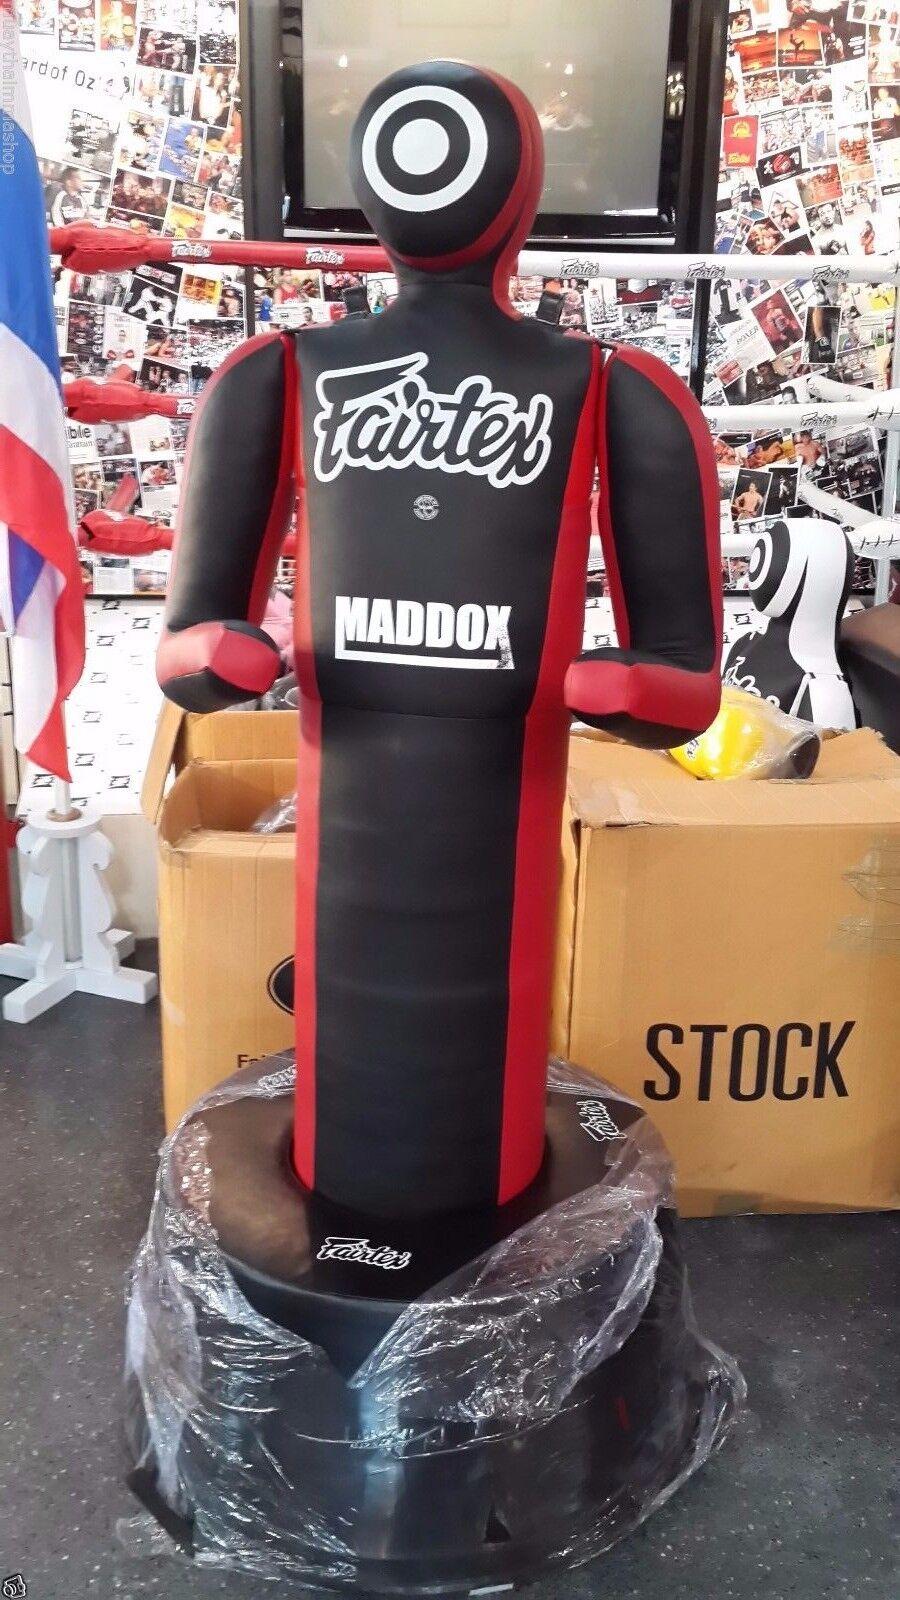 NEW MADDOX3 Hybrid GENUINE FAIRTEX Combination of MAX BAG & MADDOX3 100%Filled